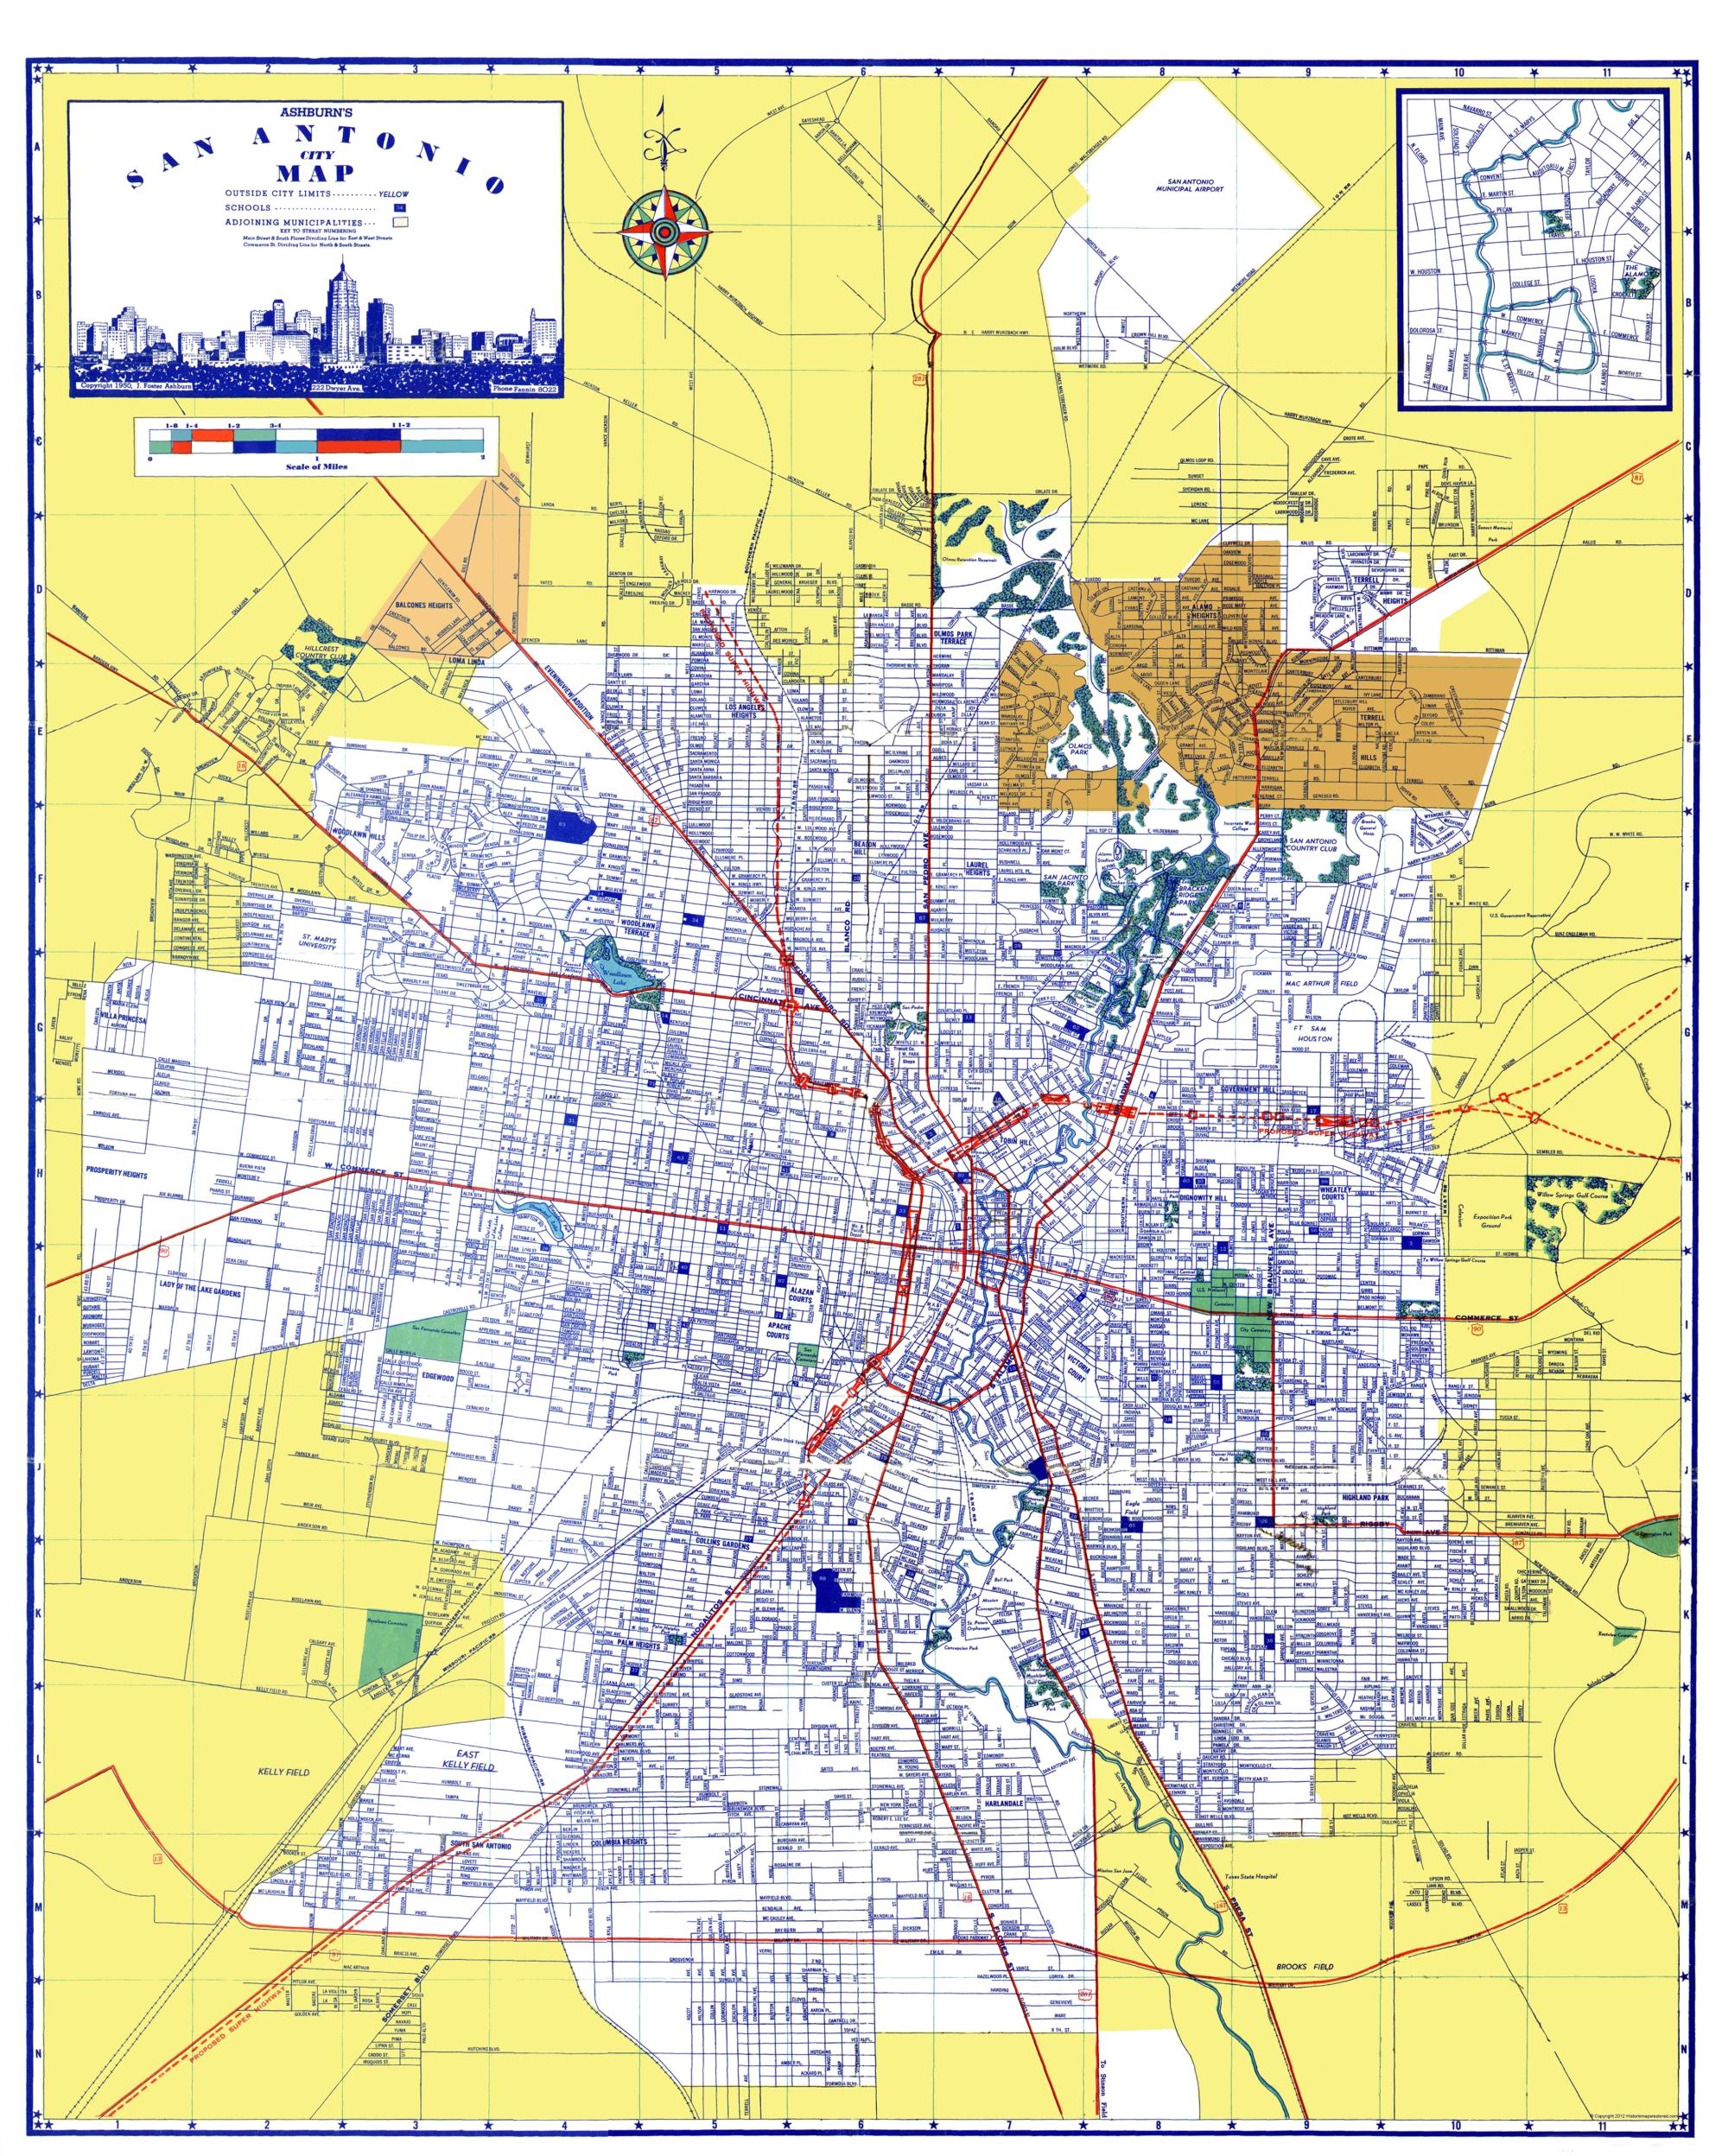 San Antonio Map Of Texas.San Antonio Texas Ashburn 1950 23 X 28 71